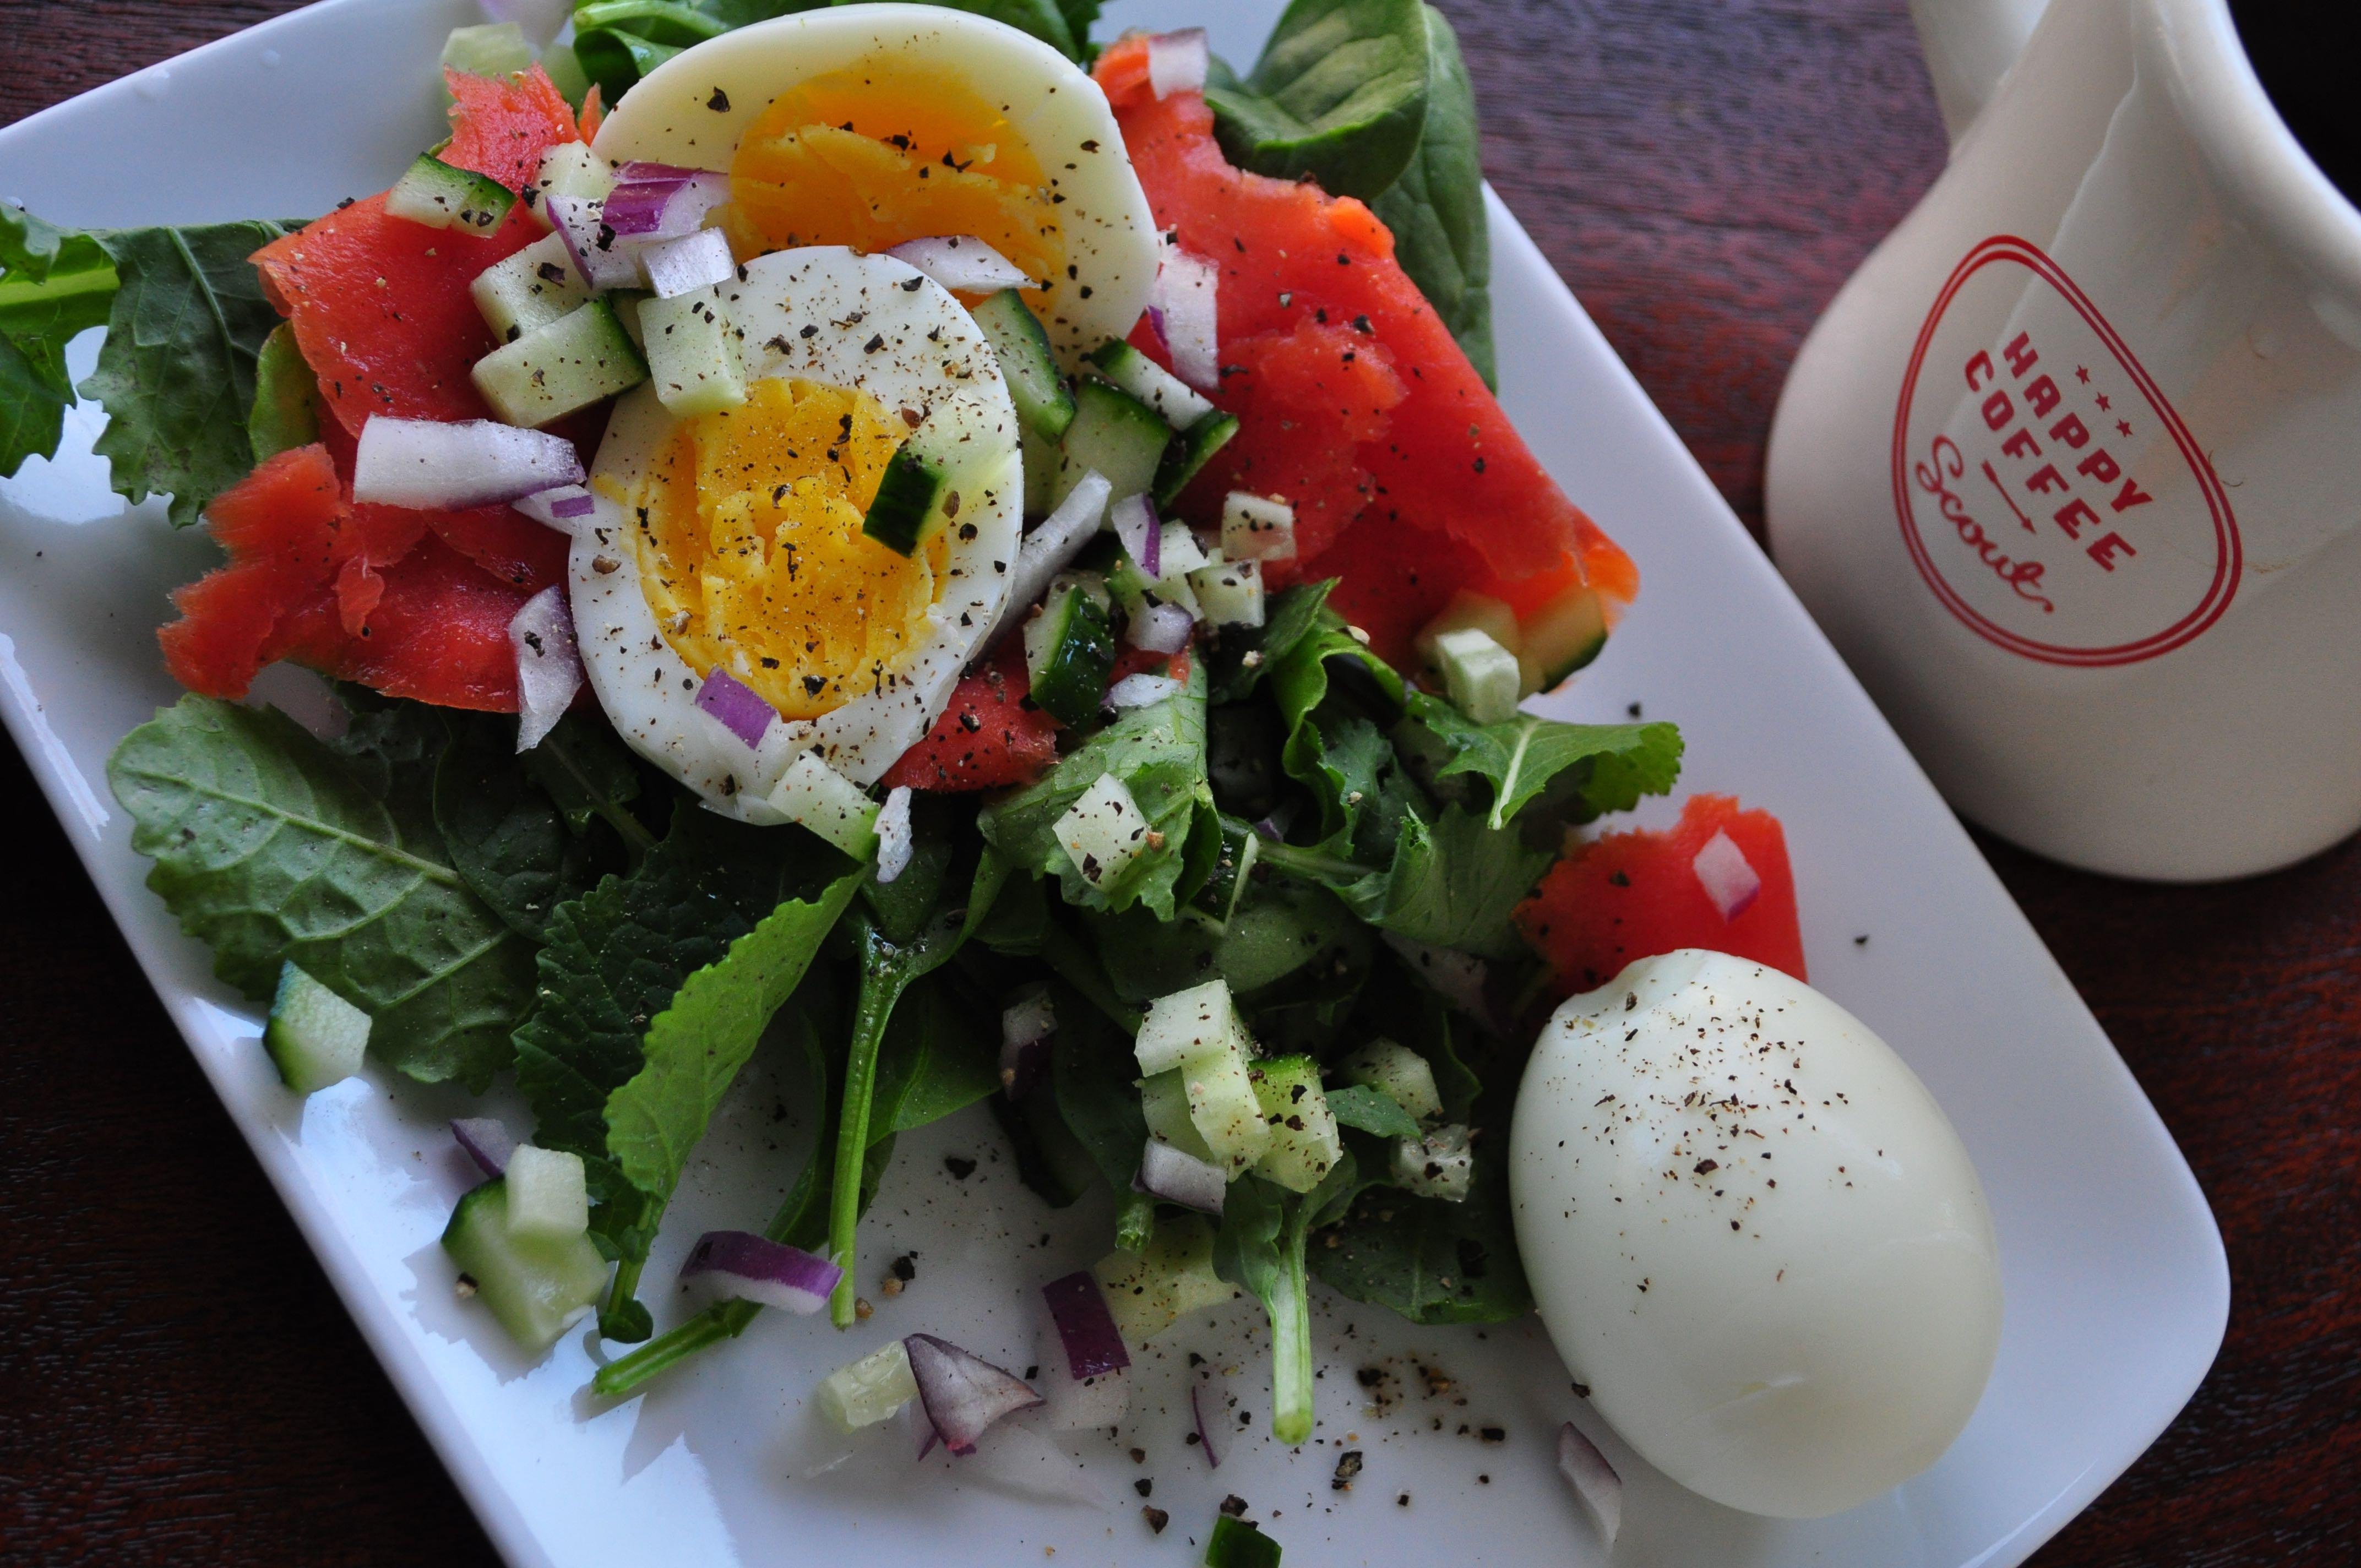 Hard Boiled Eggs Breakfast  Hard Boiled Eggs & Smoked Salmon Breakfast — What Runs Lori